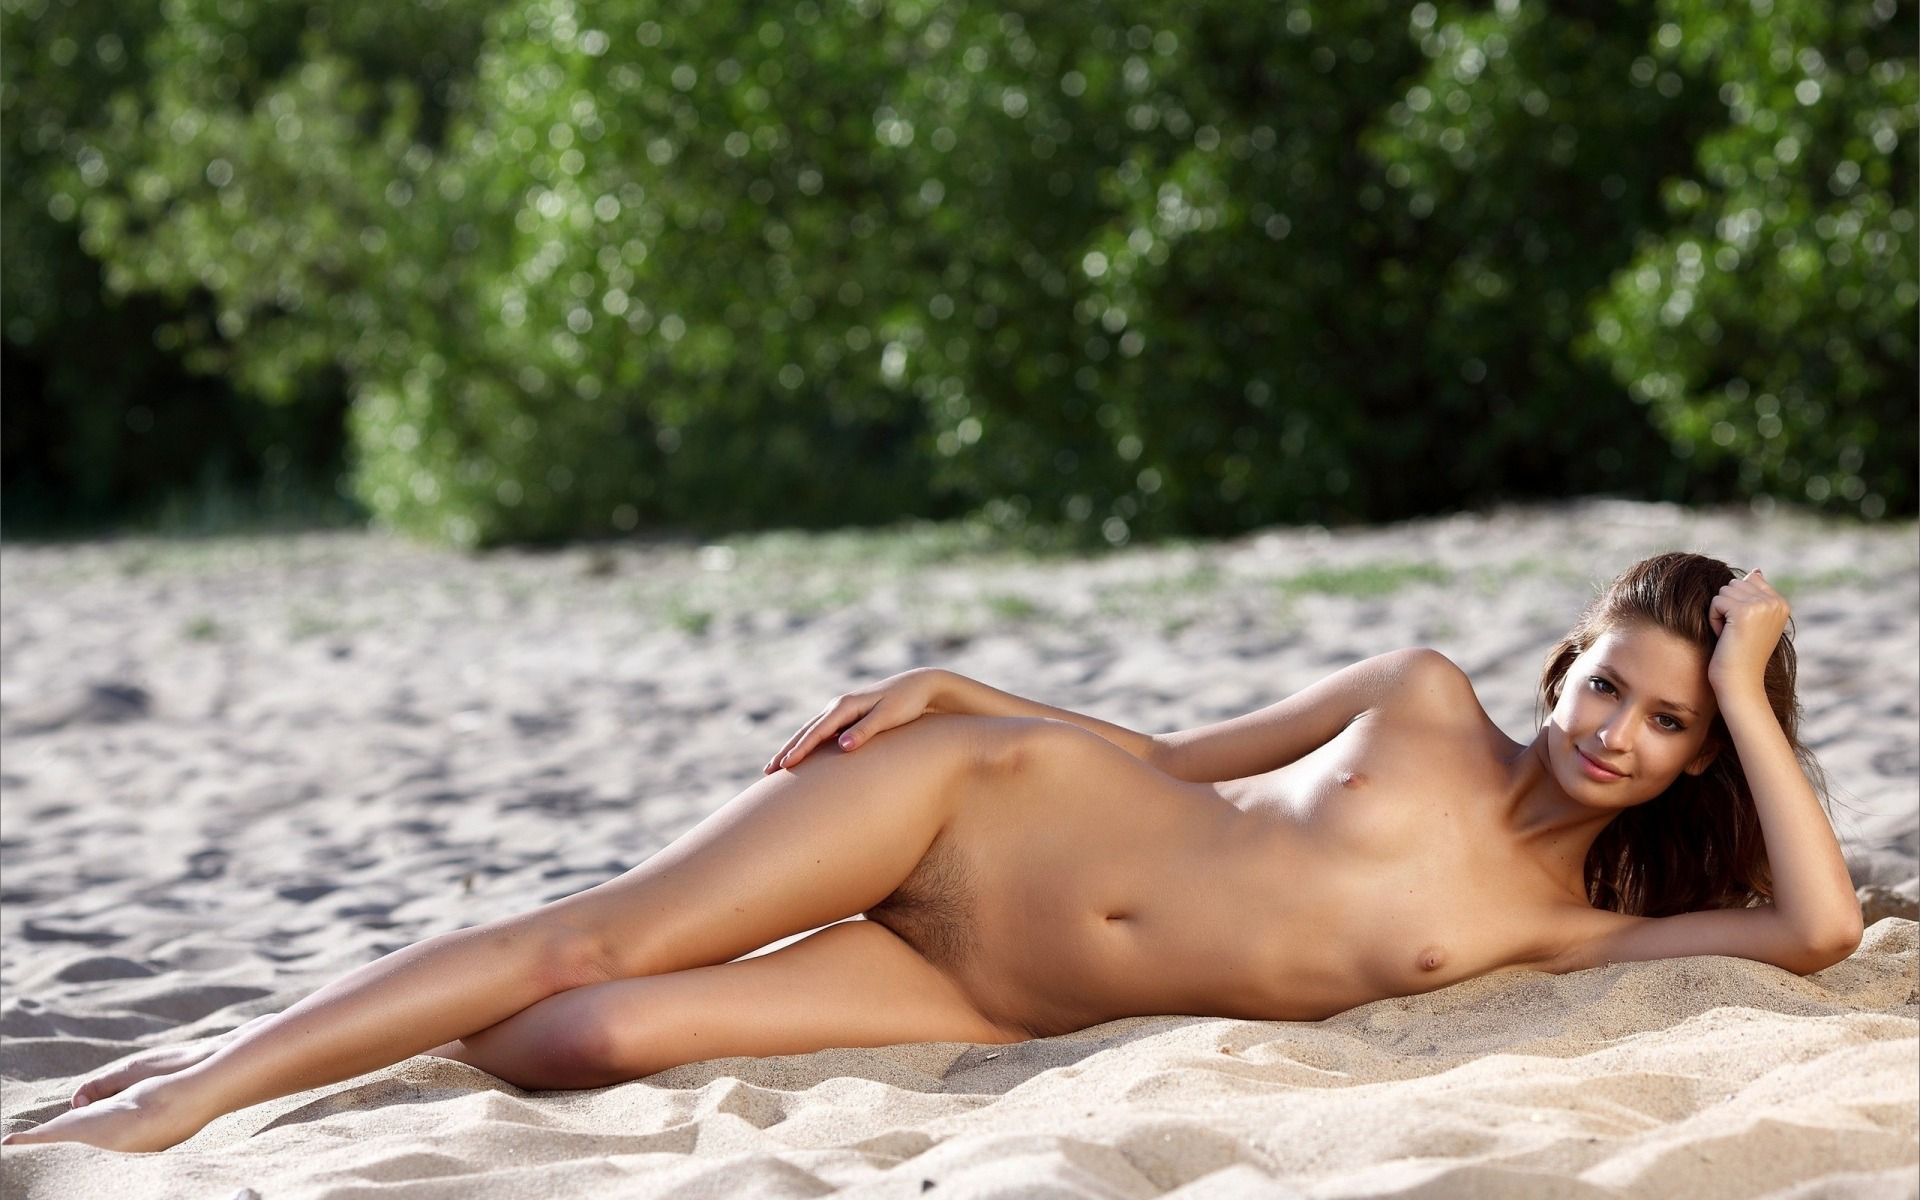 Эротика фото на пляжу 13 фотография